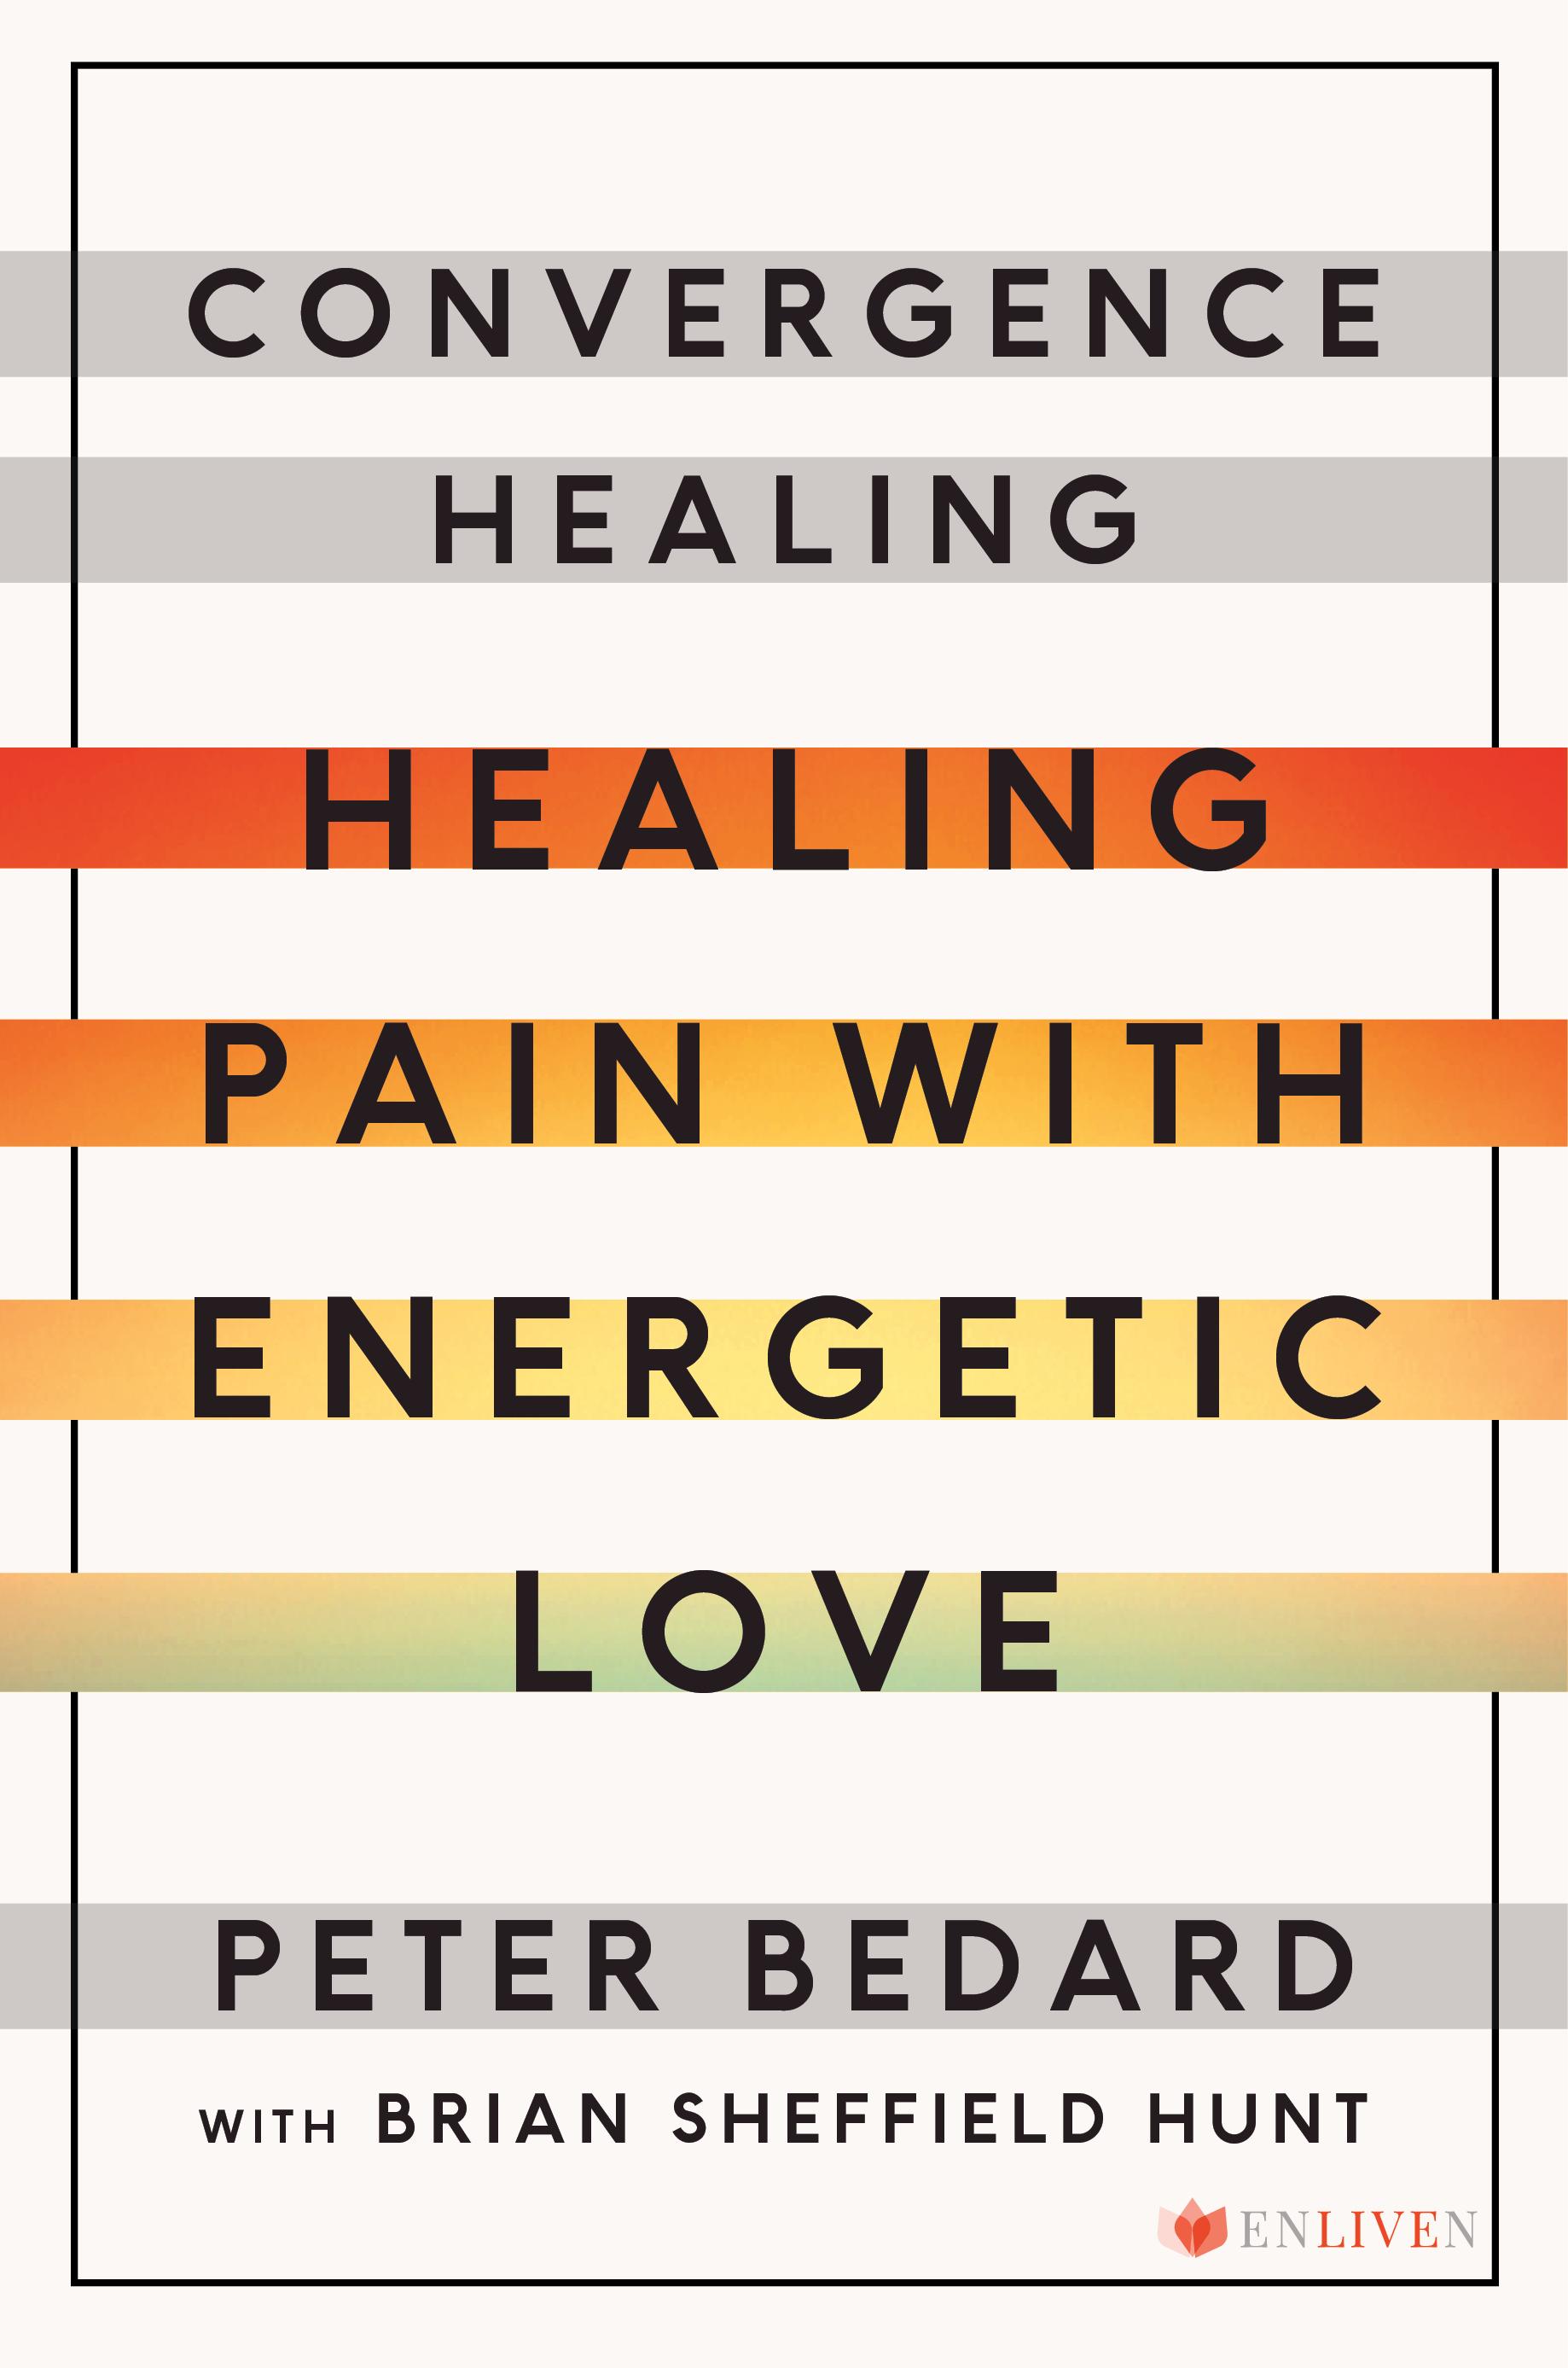 Covergence Healing.jpg